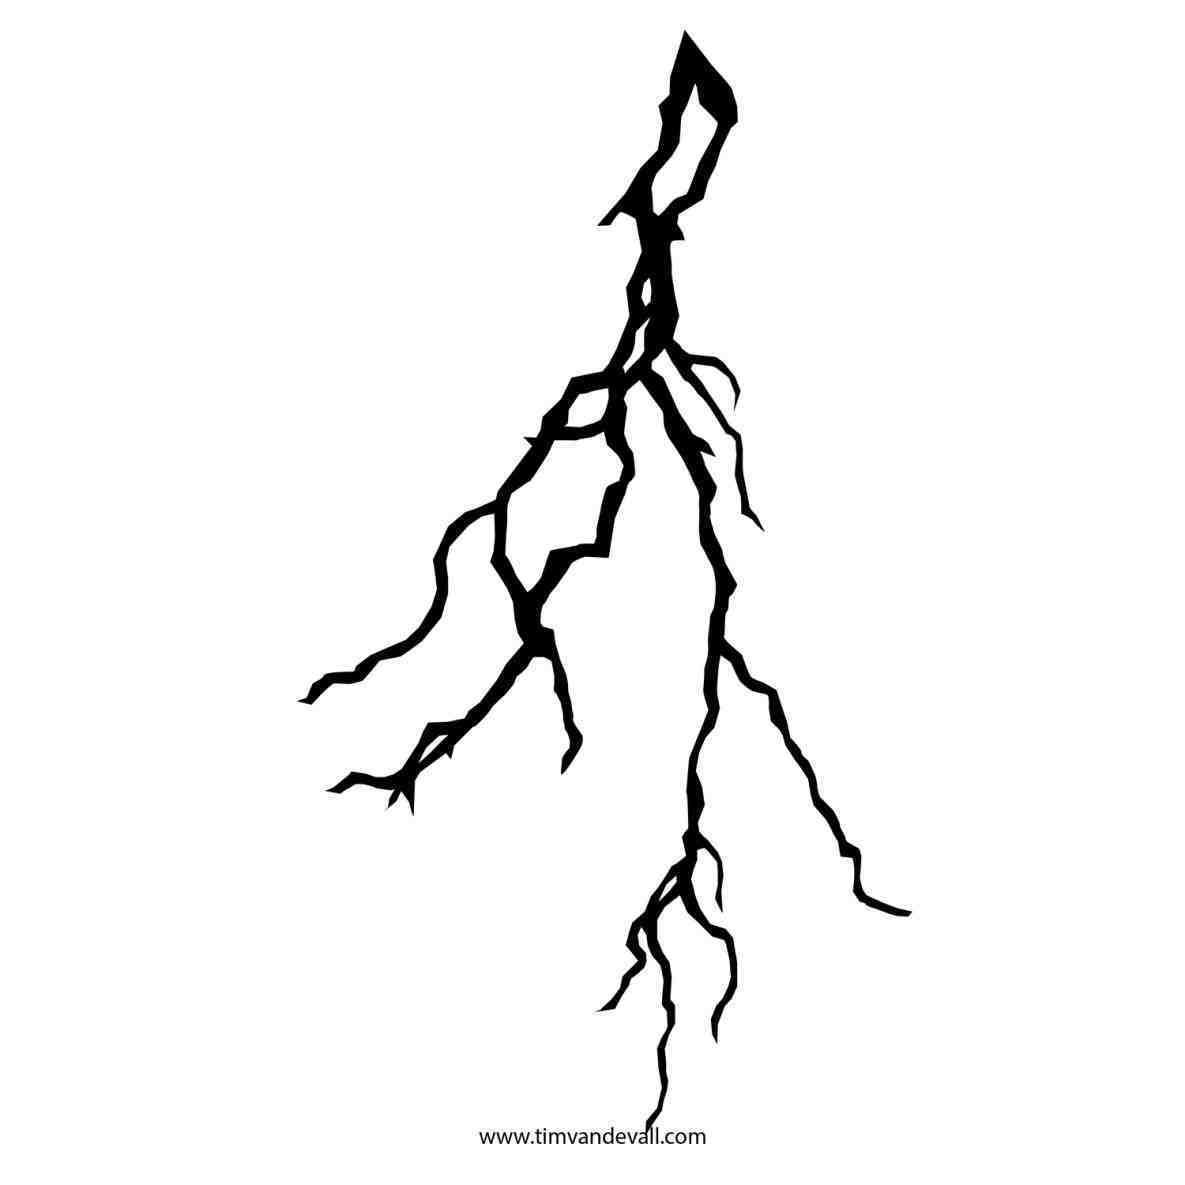 1185x1185 Thunderstorm Lighting Strikes Drawing Clipart Kaboom Pencil